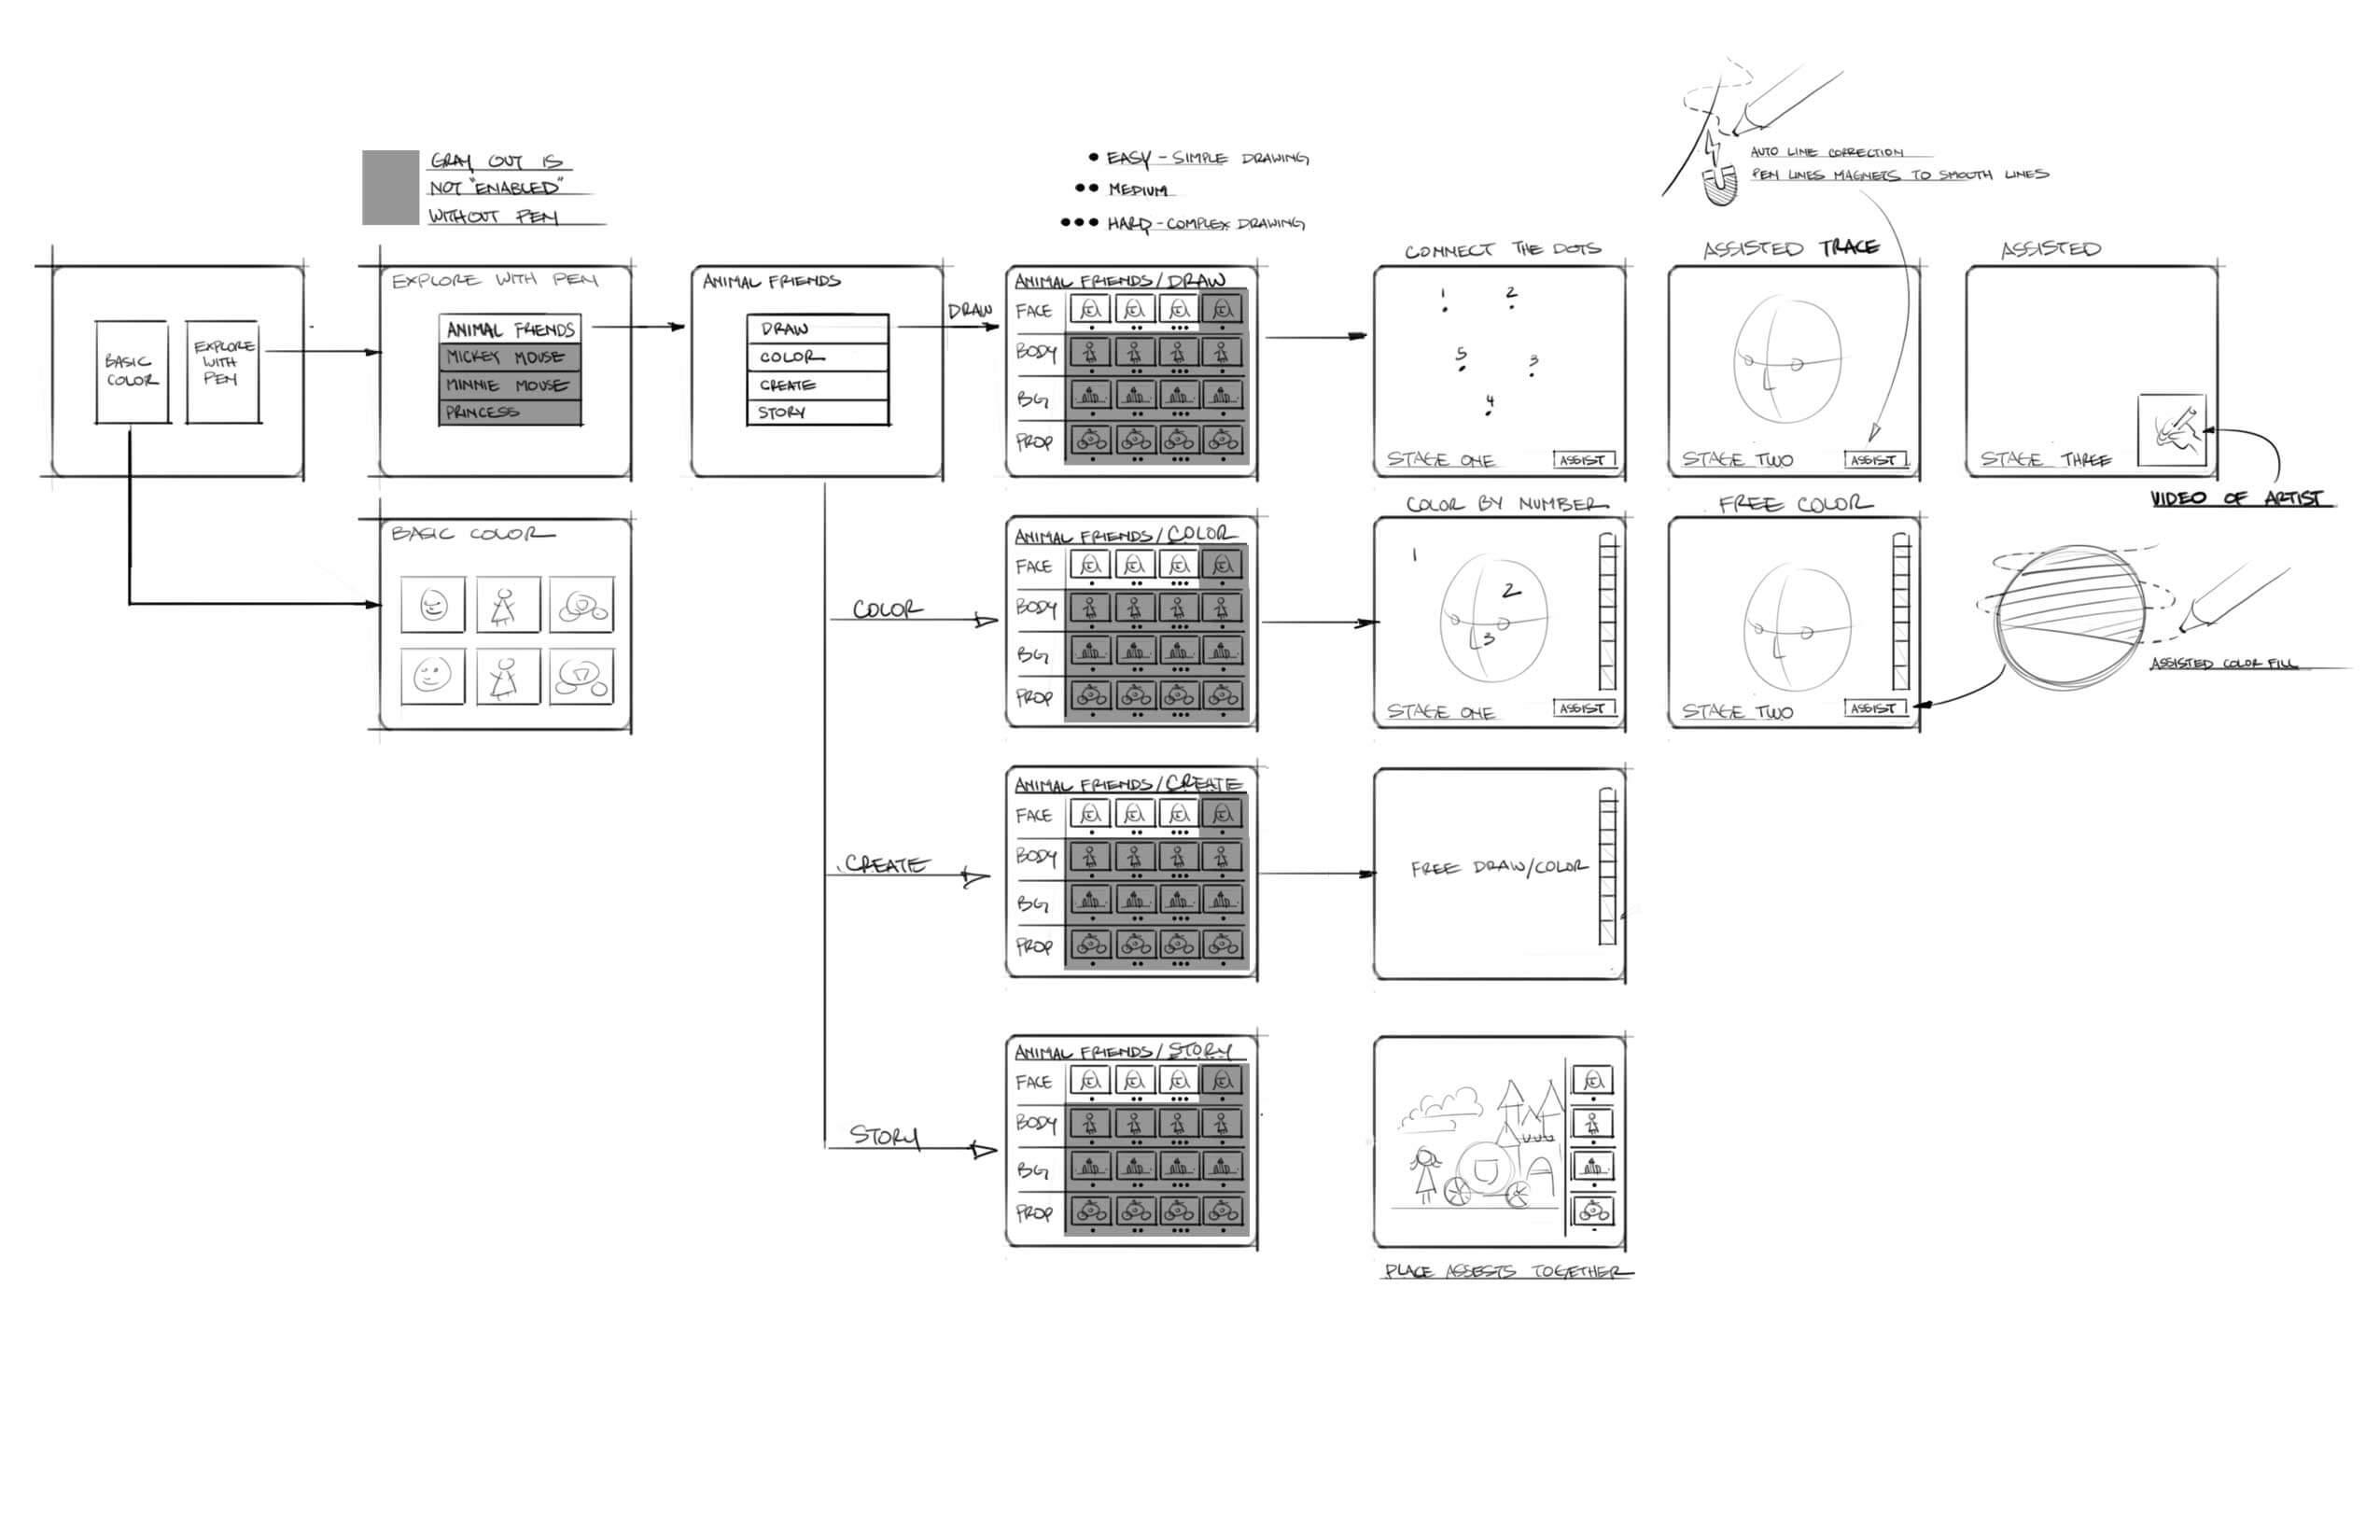 Detailed UI Flow Sketch